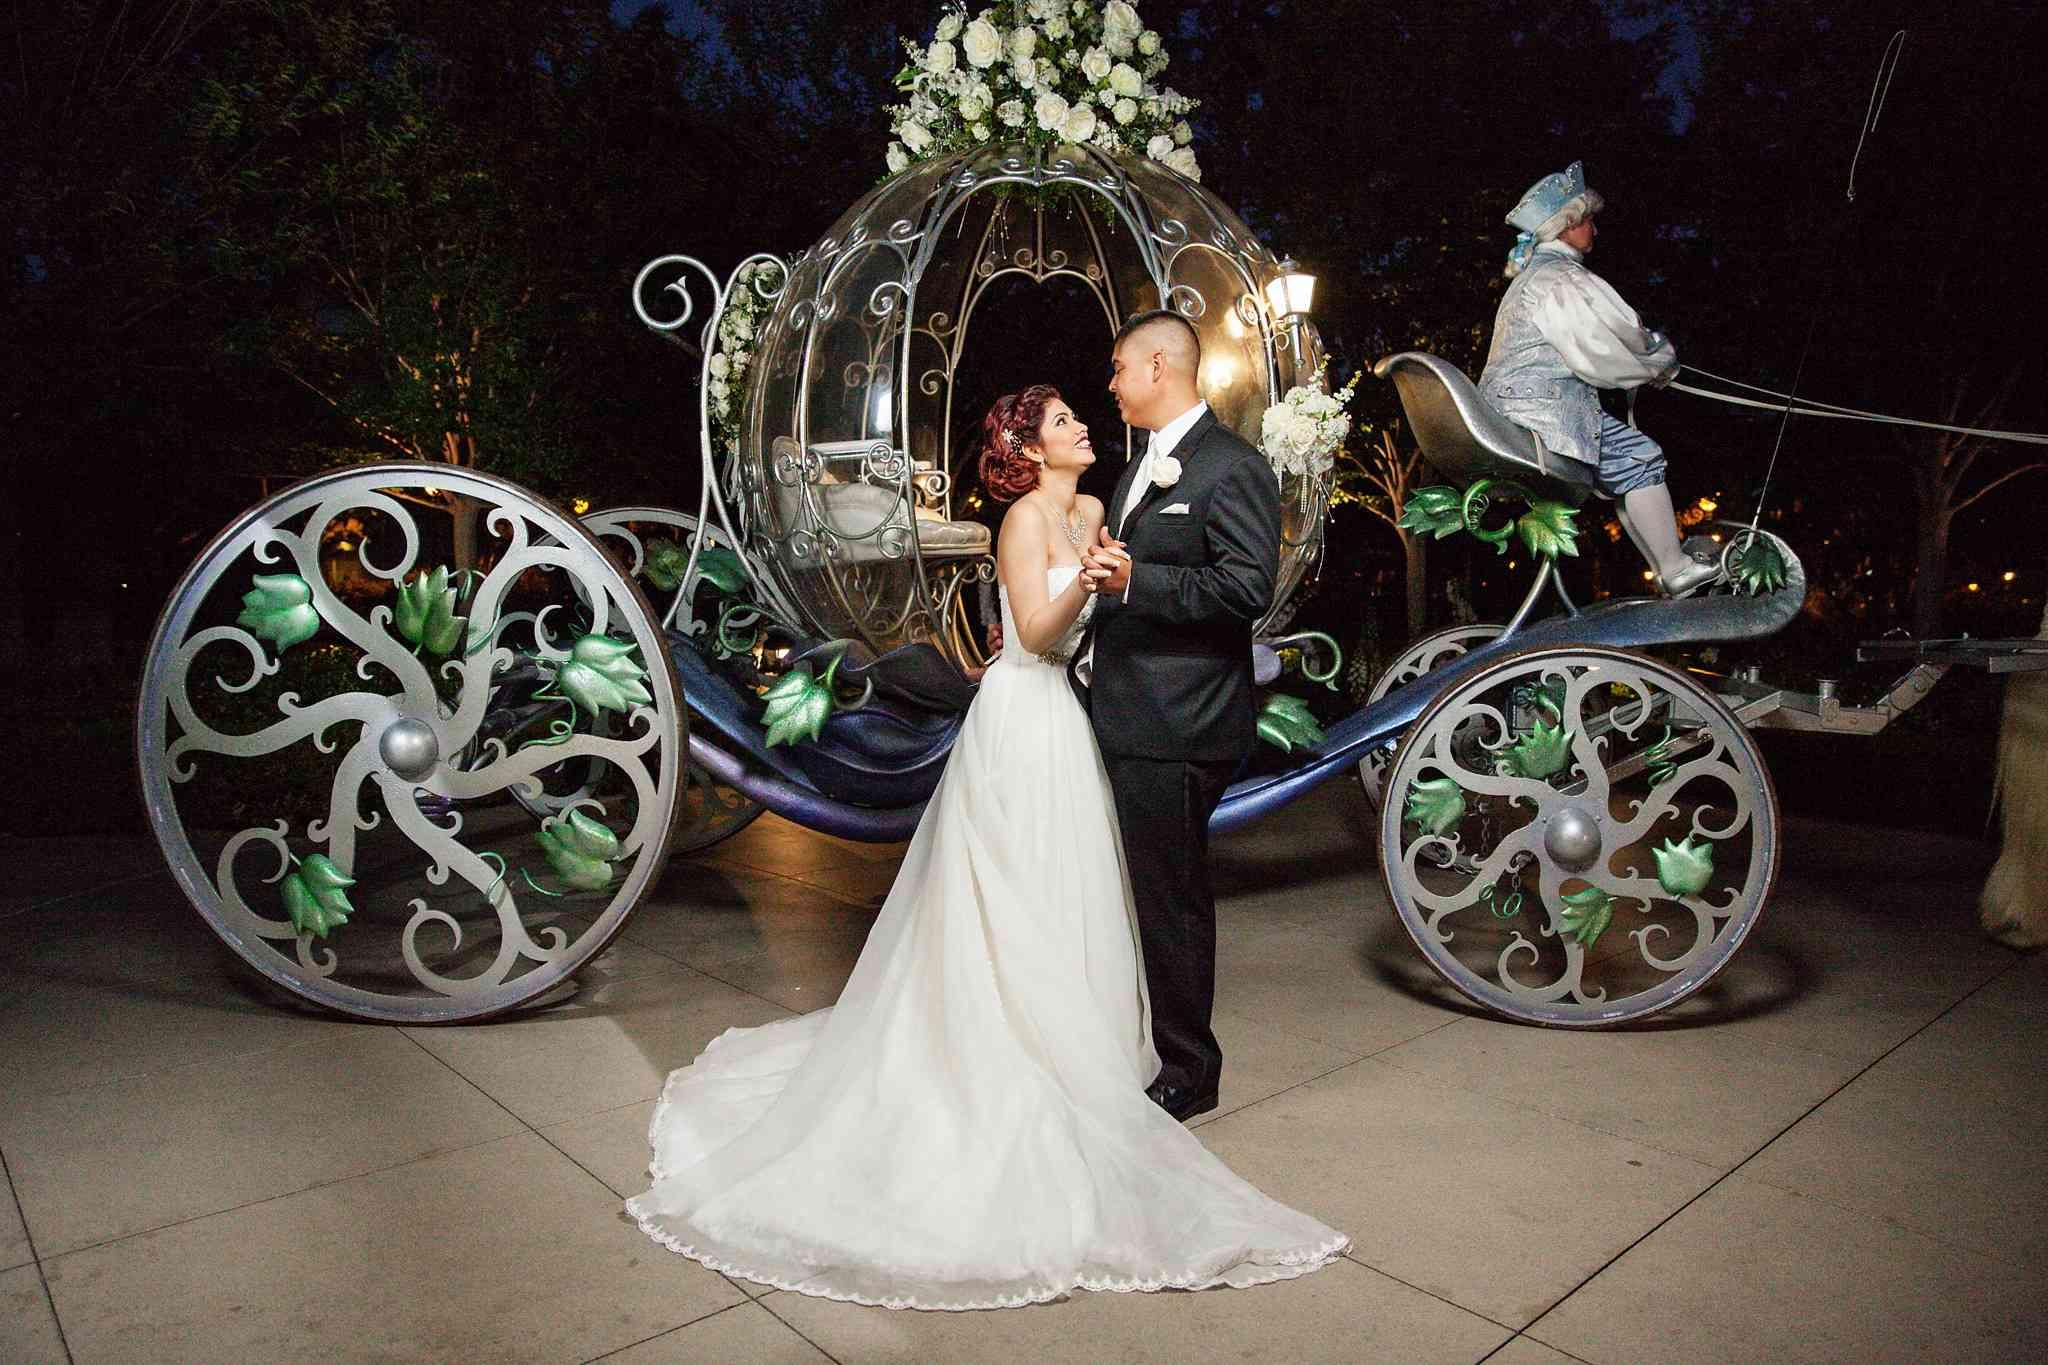 casamento-na-disney-noiva-carruagem-cinderella